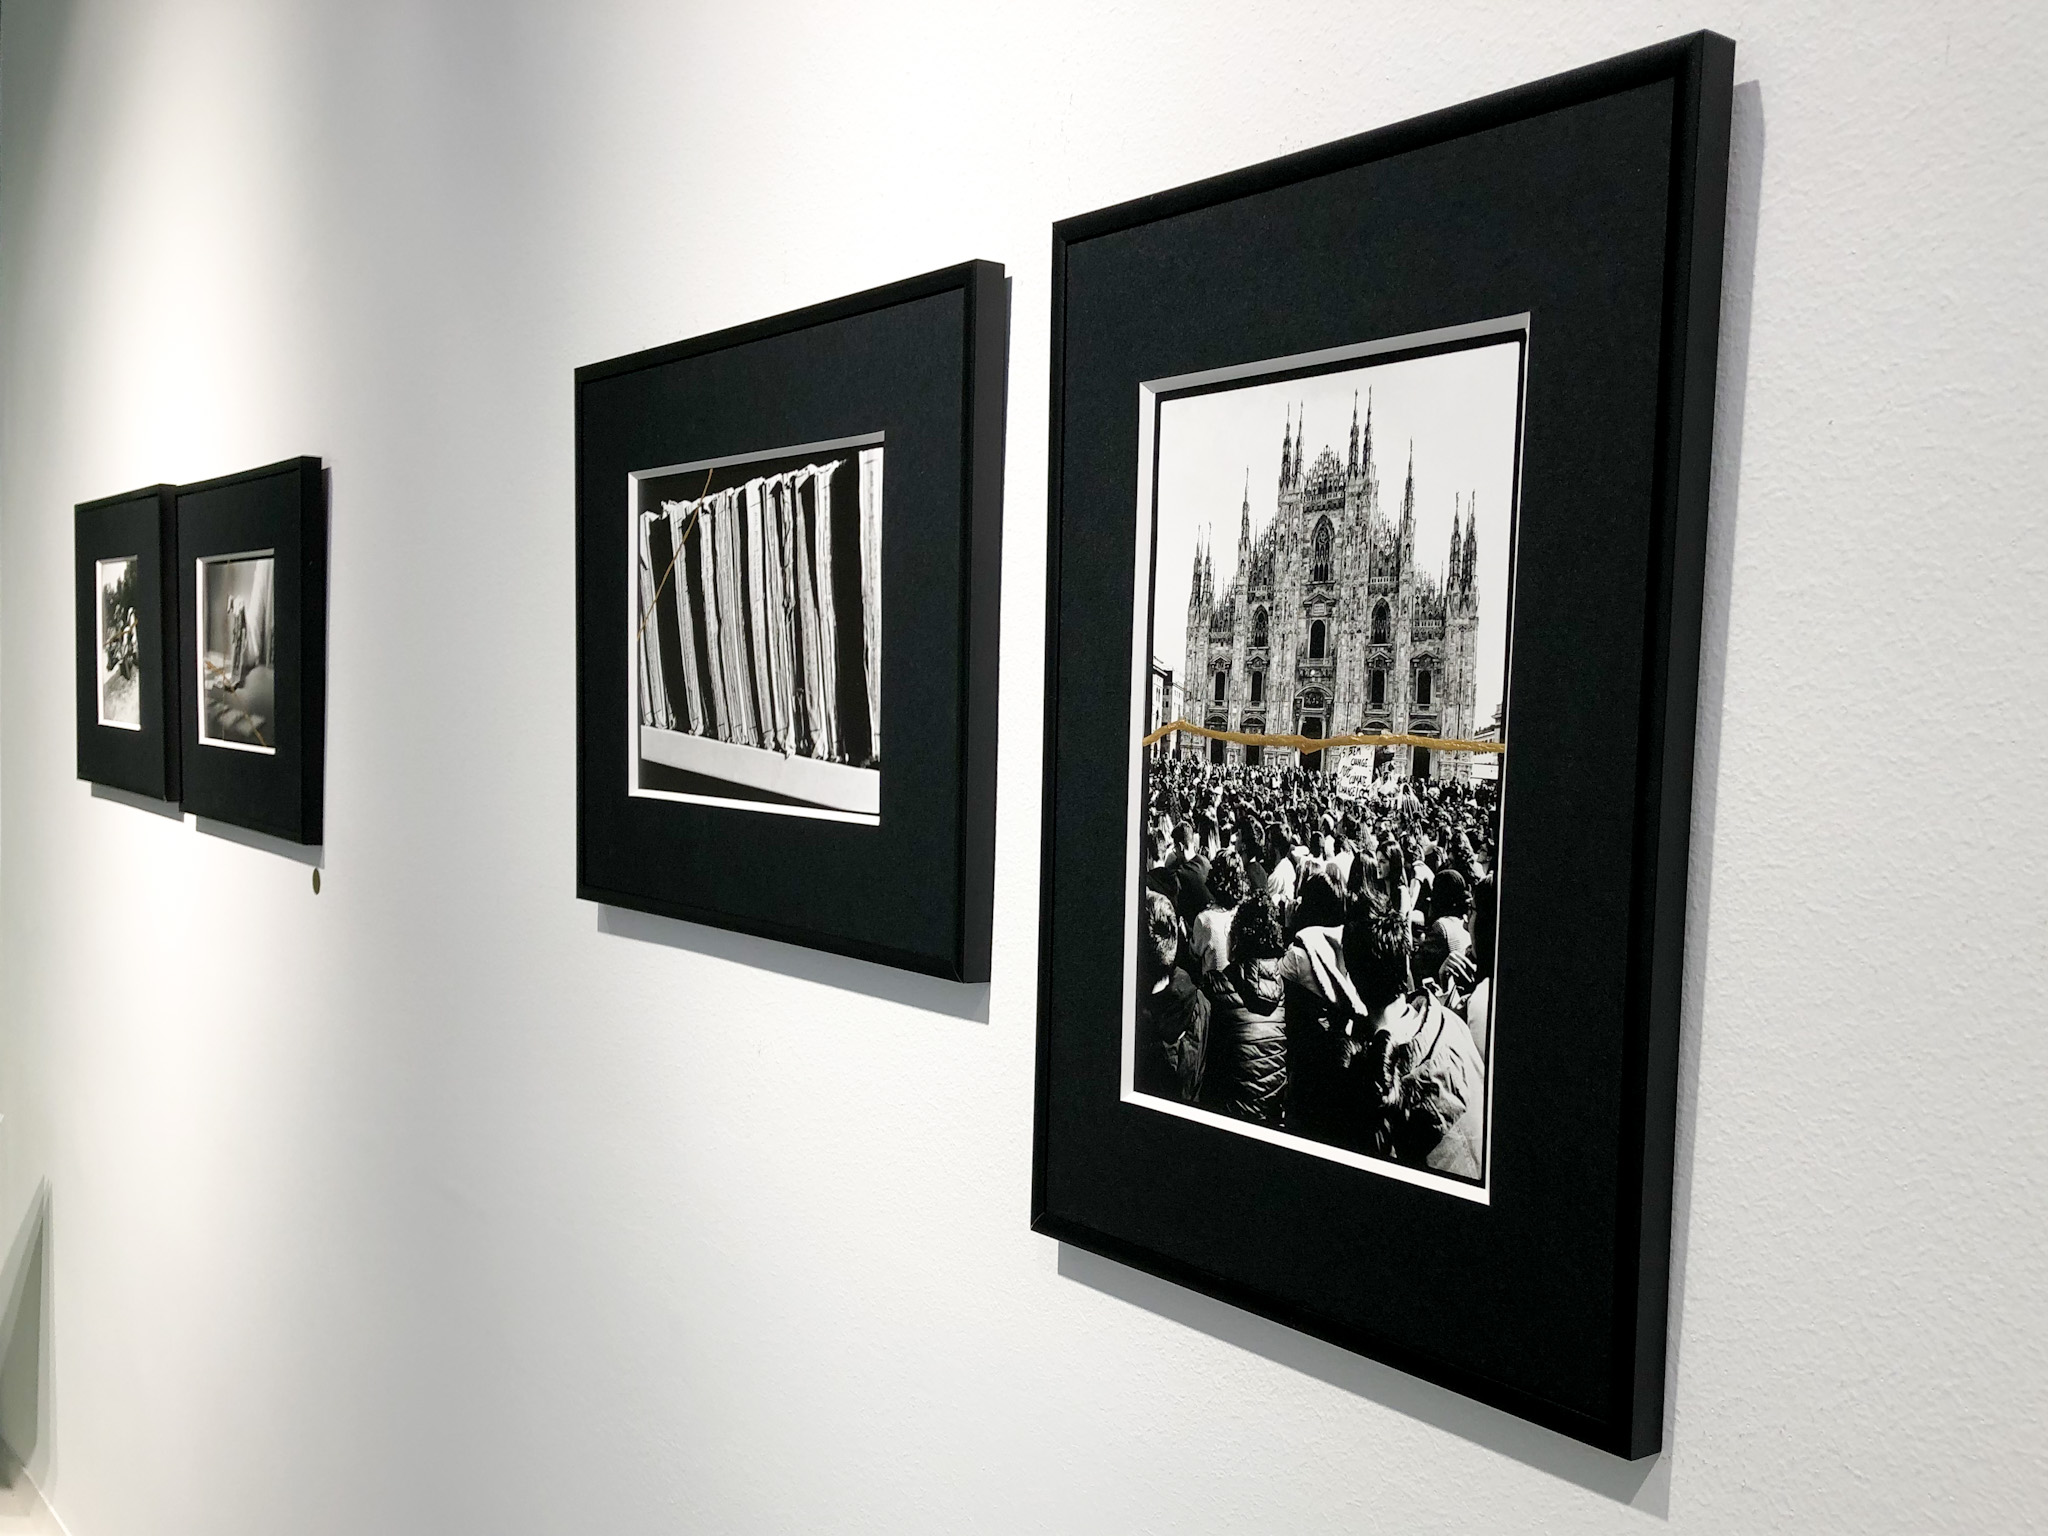 mostra kintsugi fotografia milano galleria expowall